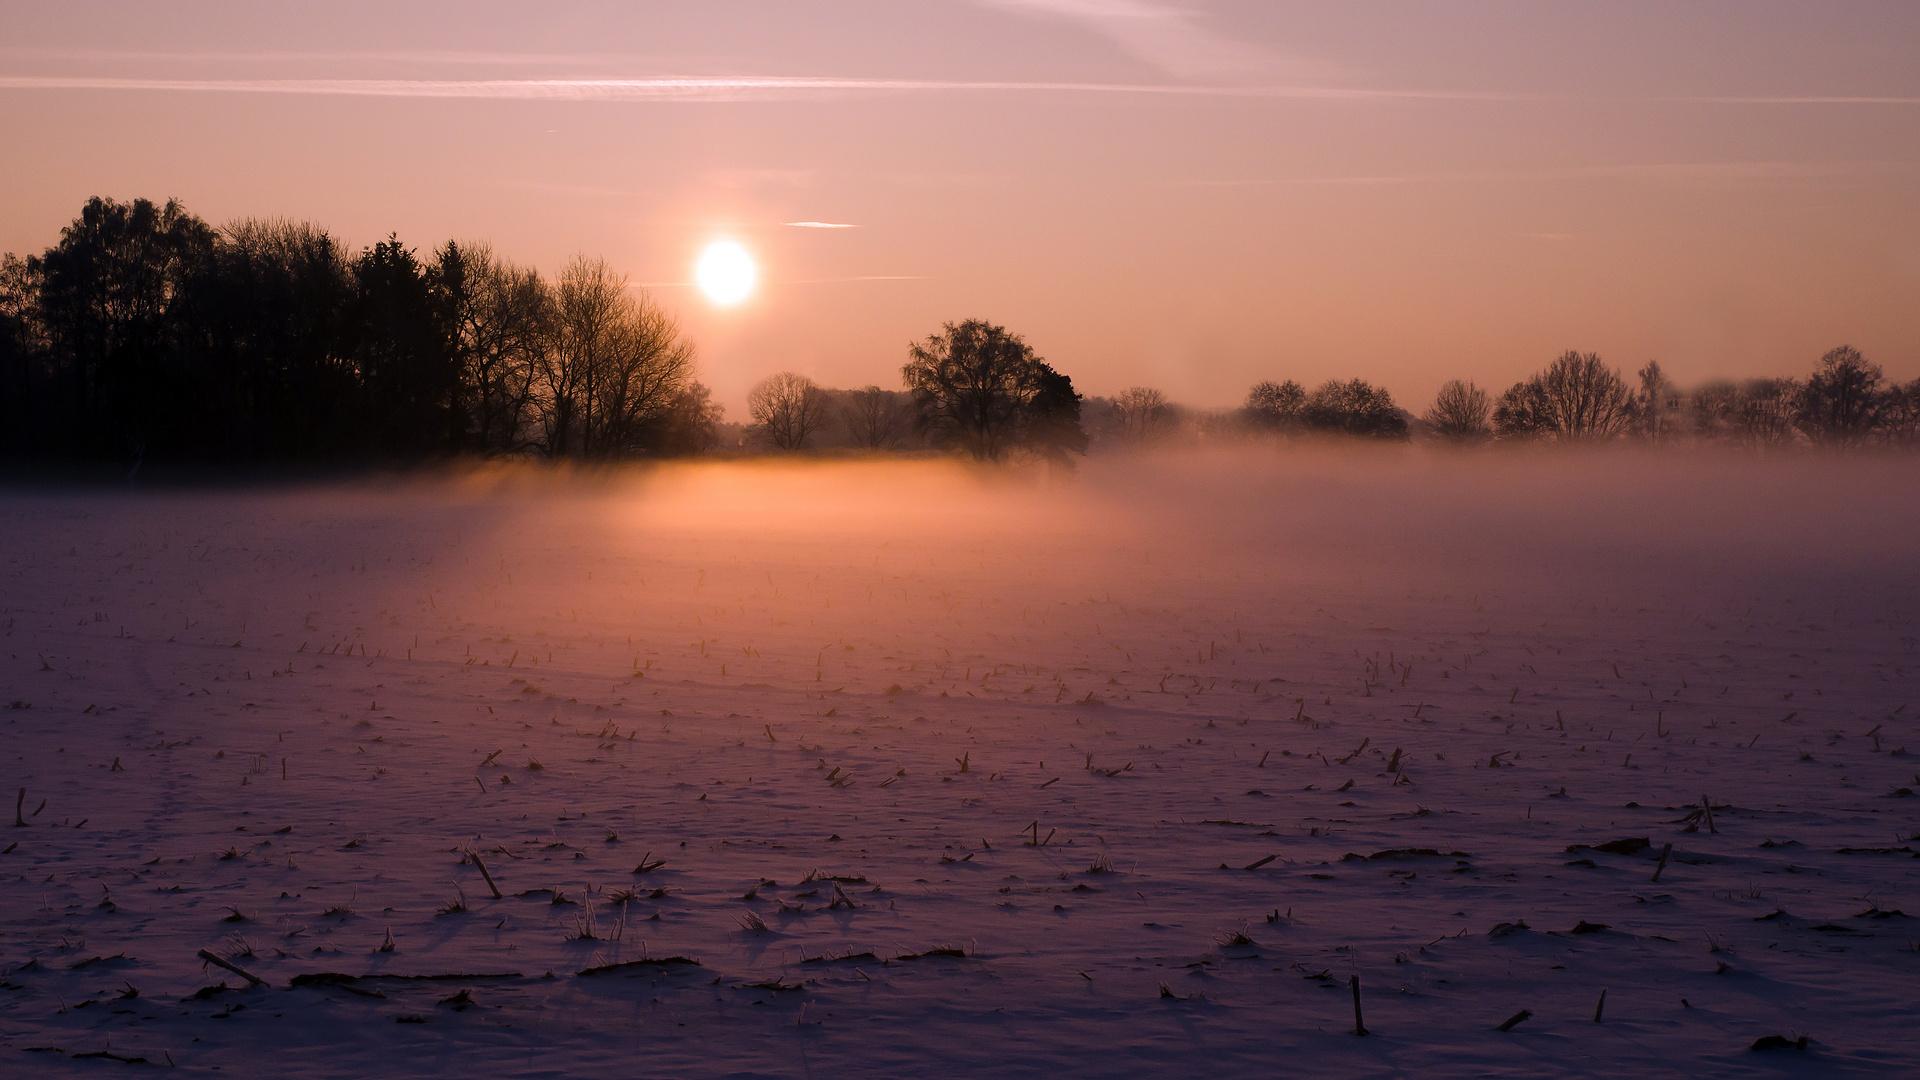 Schnee, Nebel, Sonne...